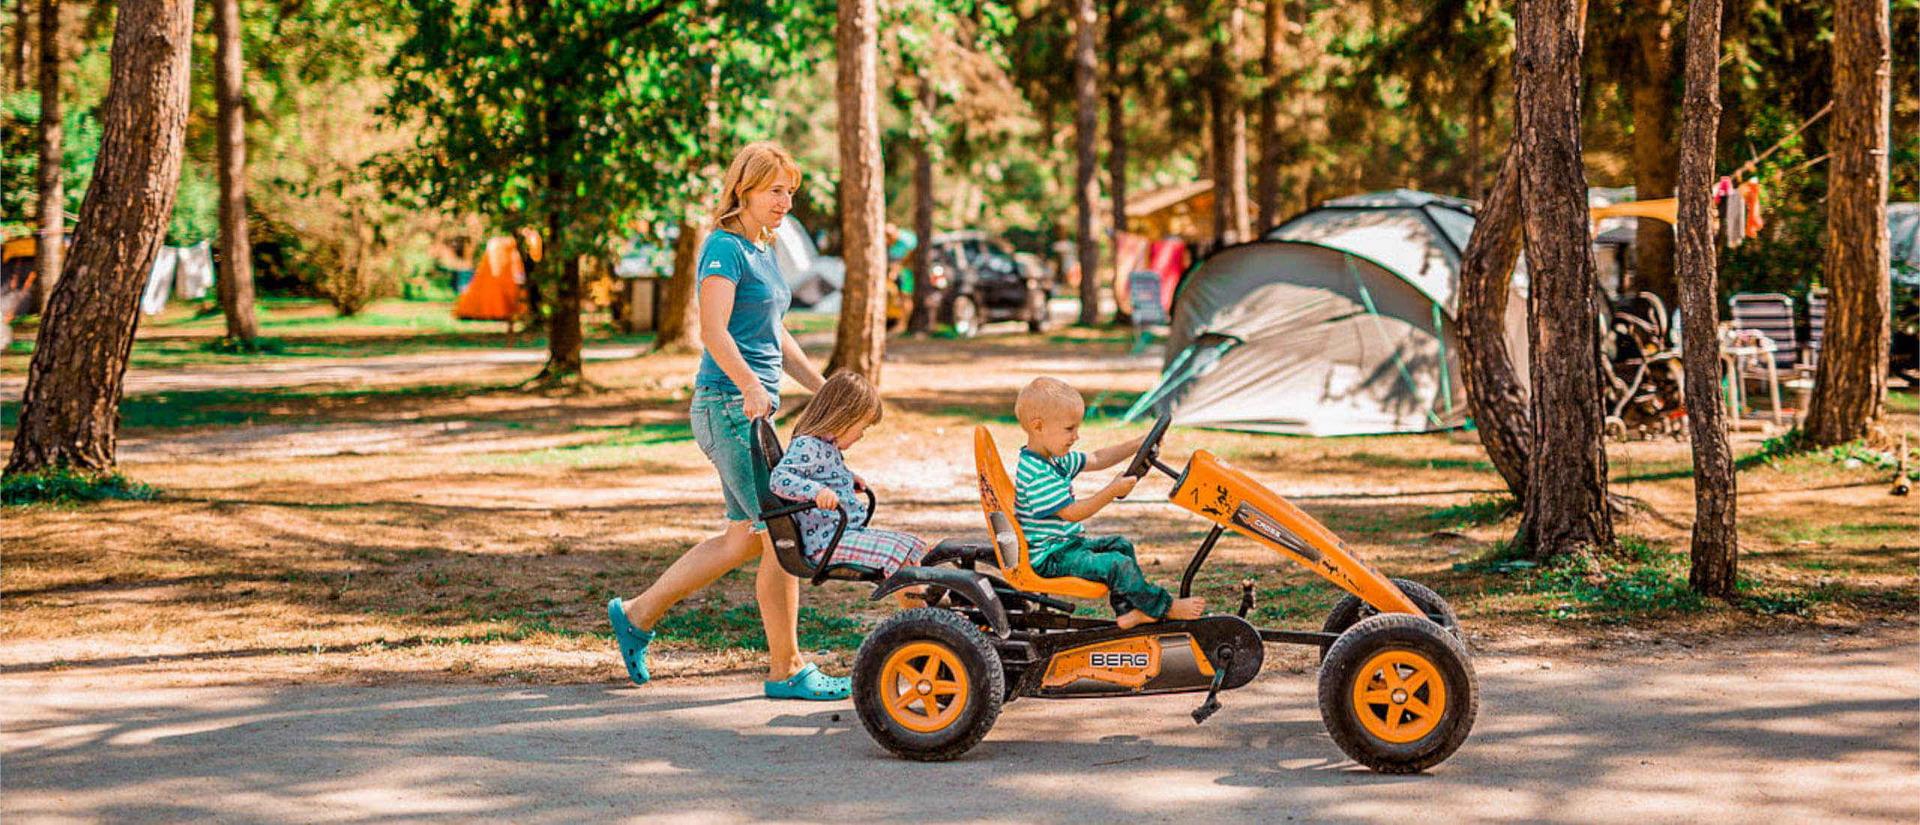 gokart_funpark_camping_menina